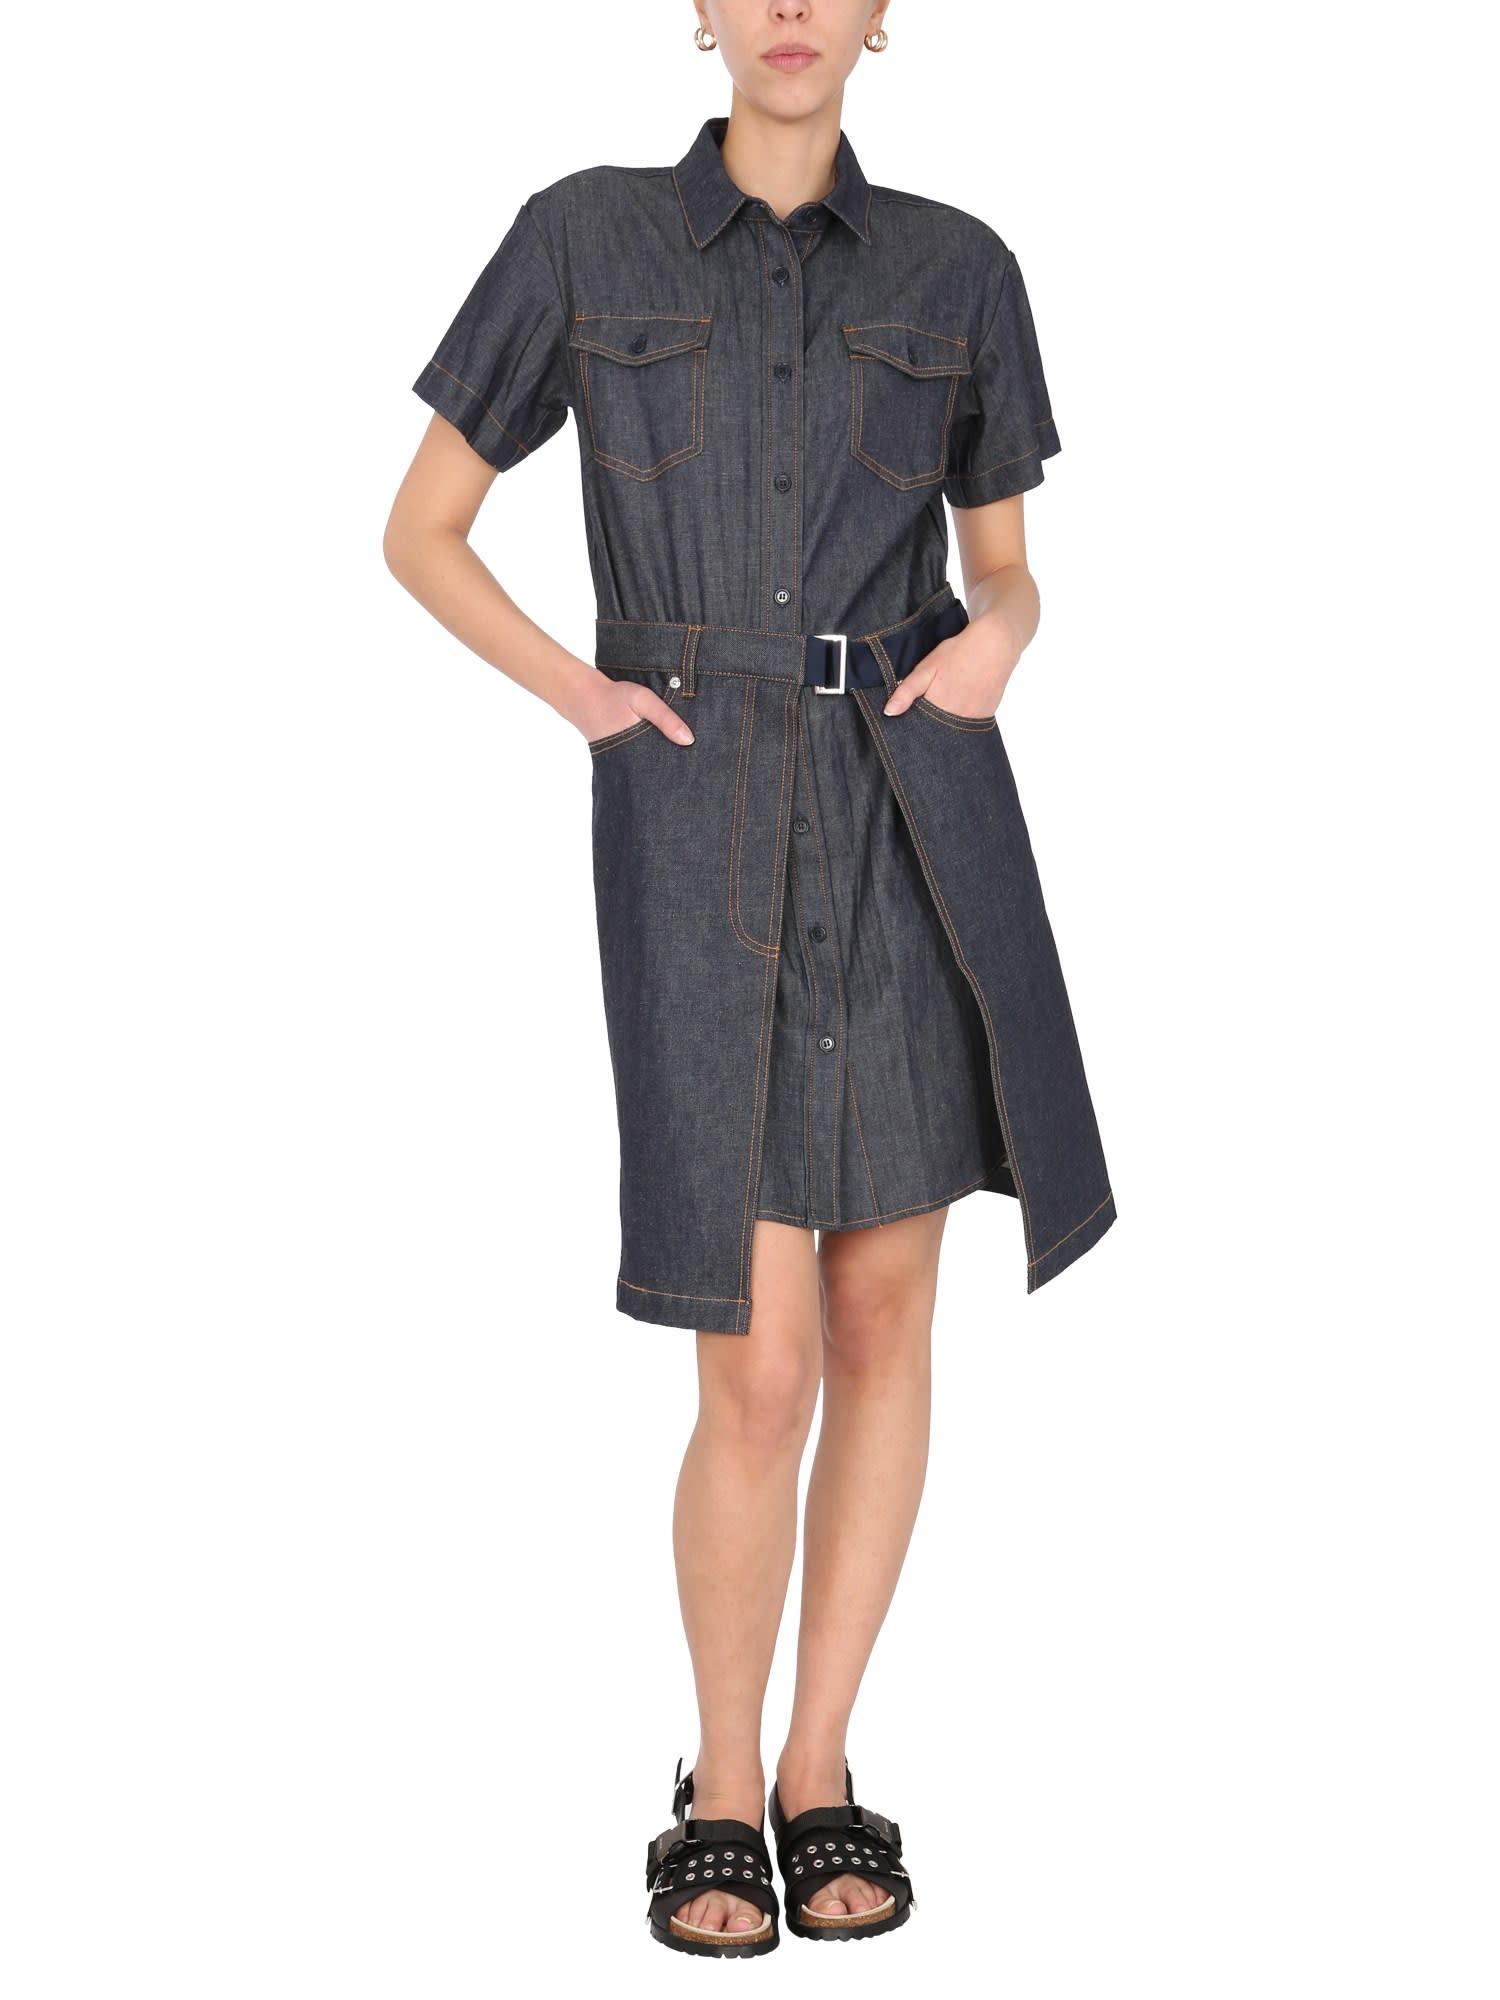 Buy A.P.C. x Sacai Robe Keiko Dress online, shop A.P.C. x Sacai with free shipping